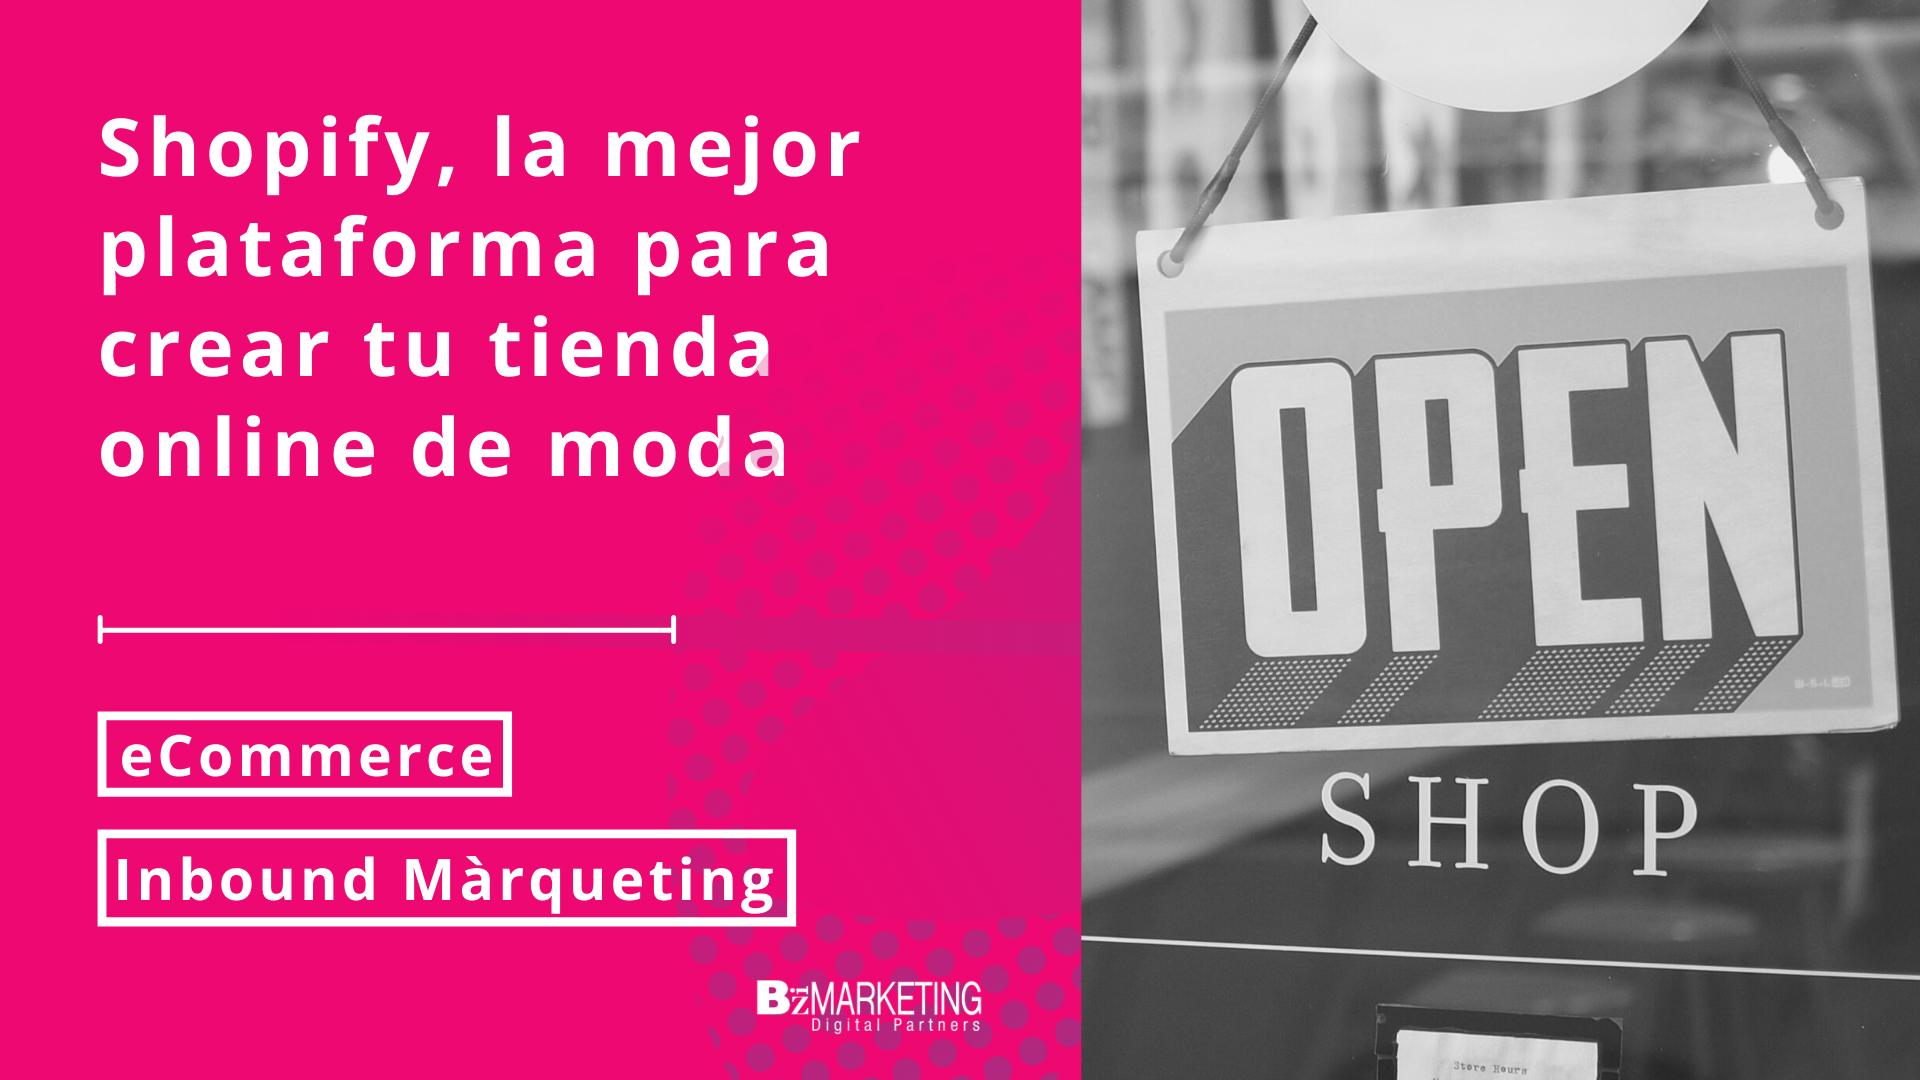 Shopify la mejor plataforma para crear tu tienda online de moda retail BizMarketing